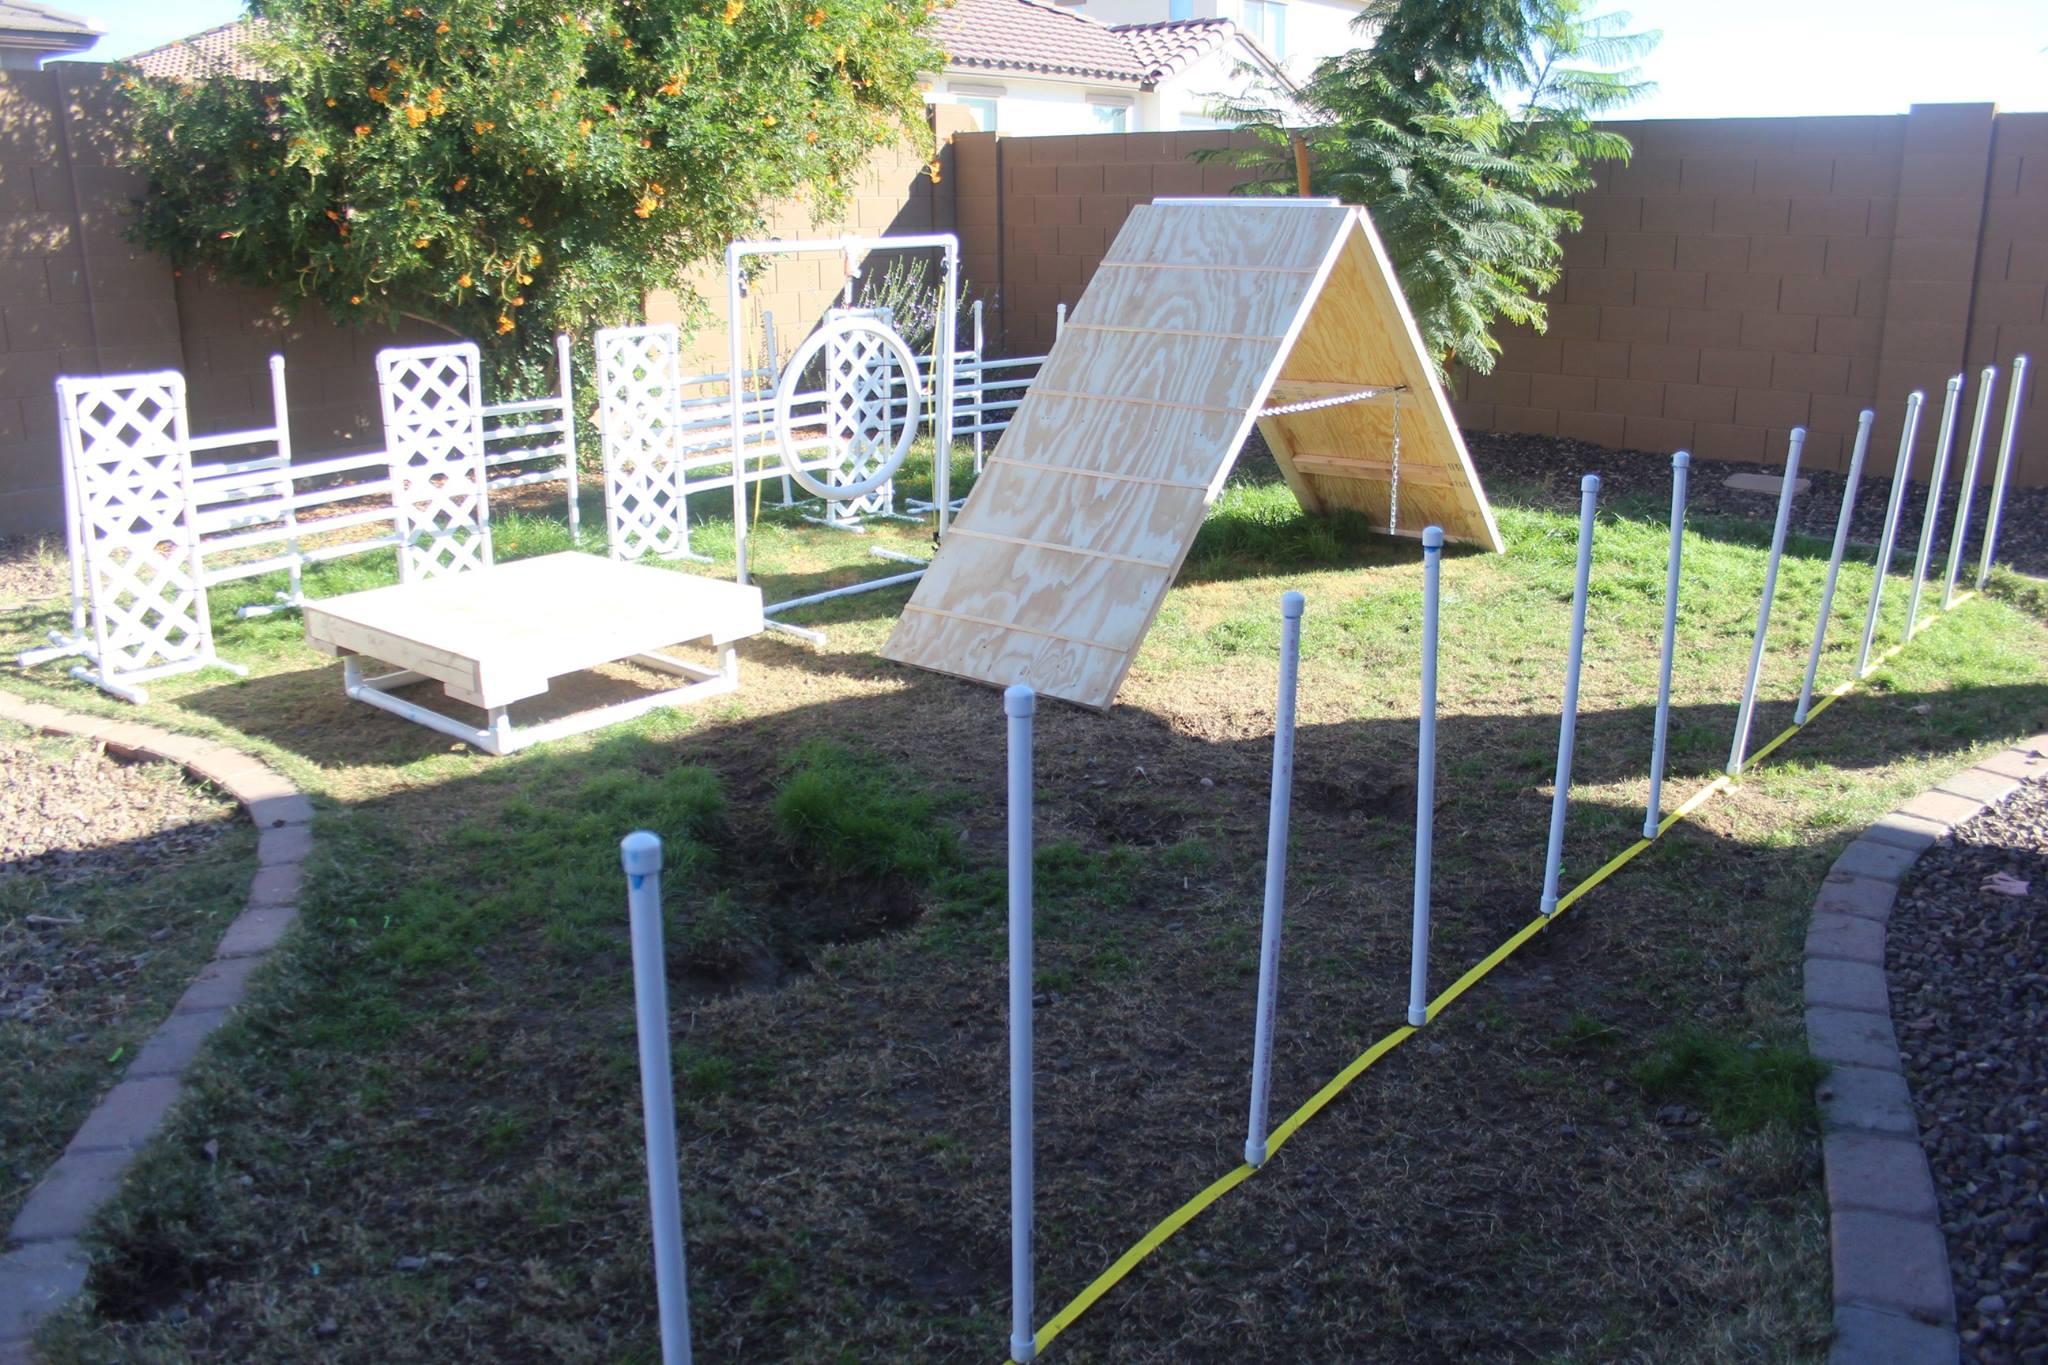 Built Dog Agility Course For Veteranu0027s Organization